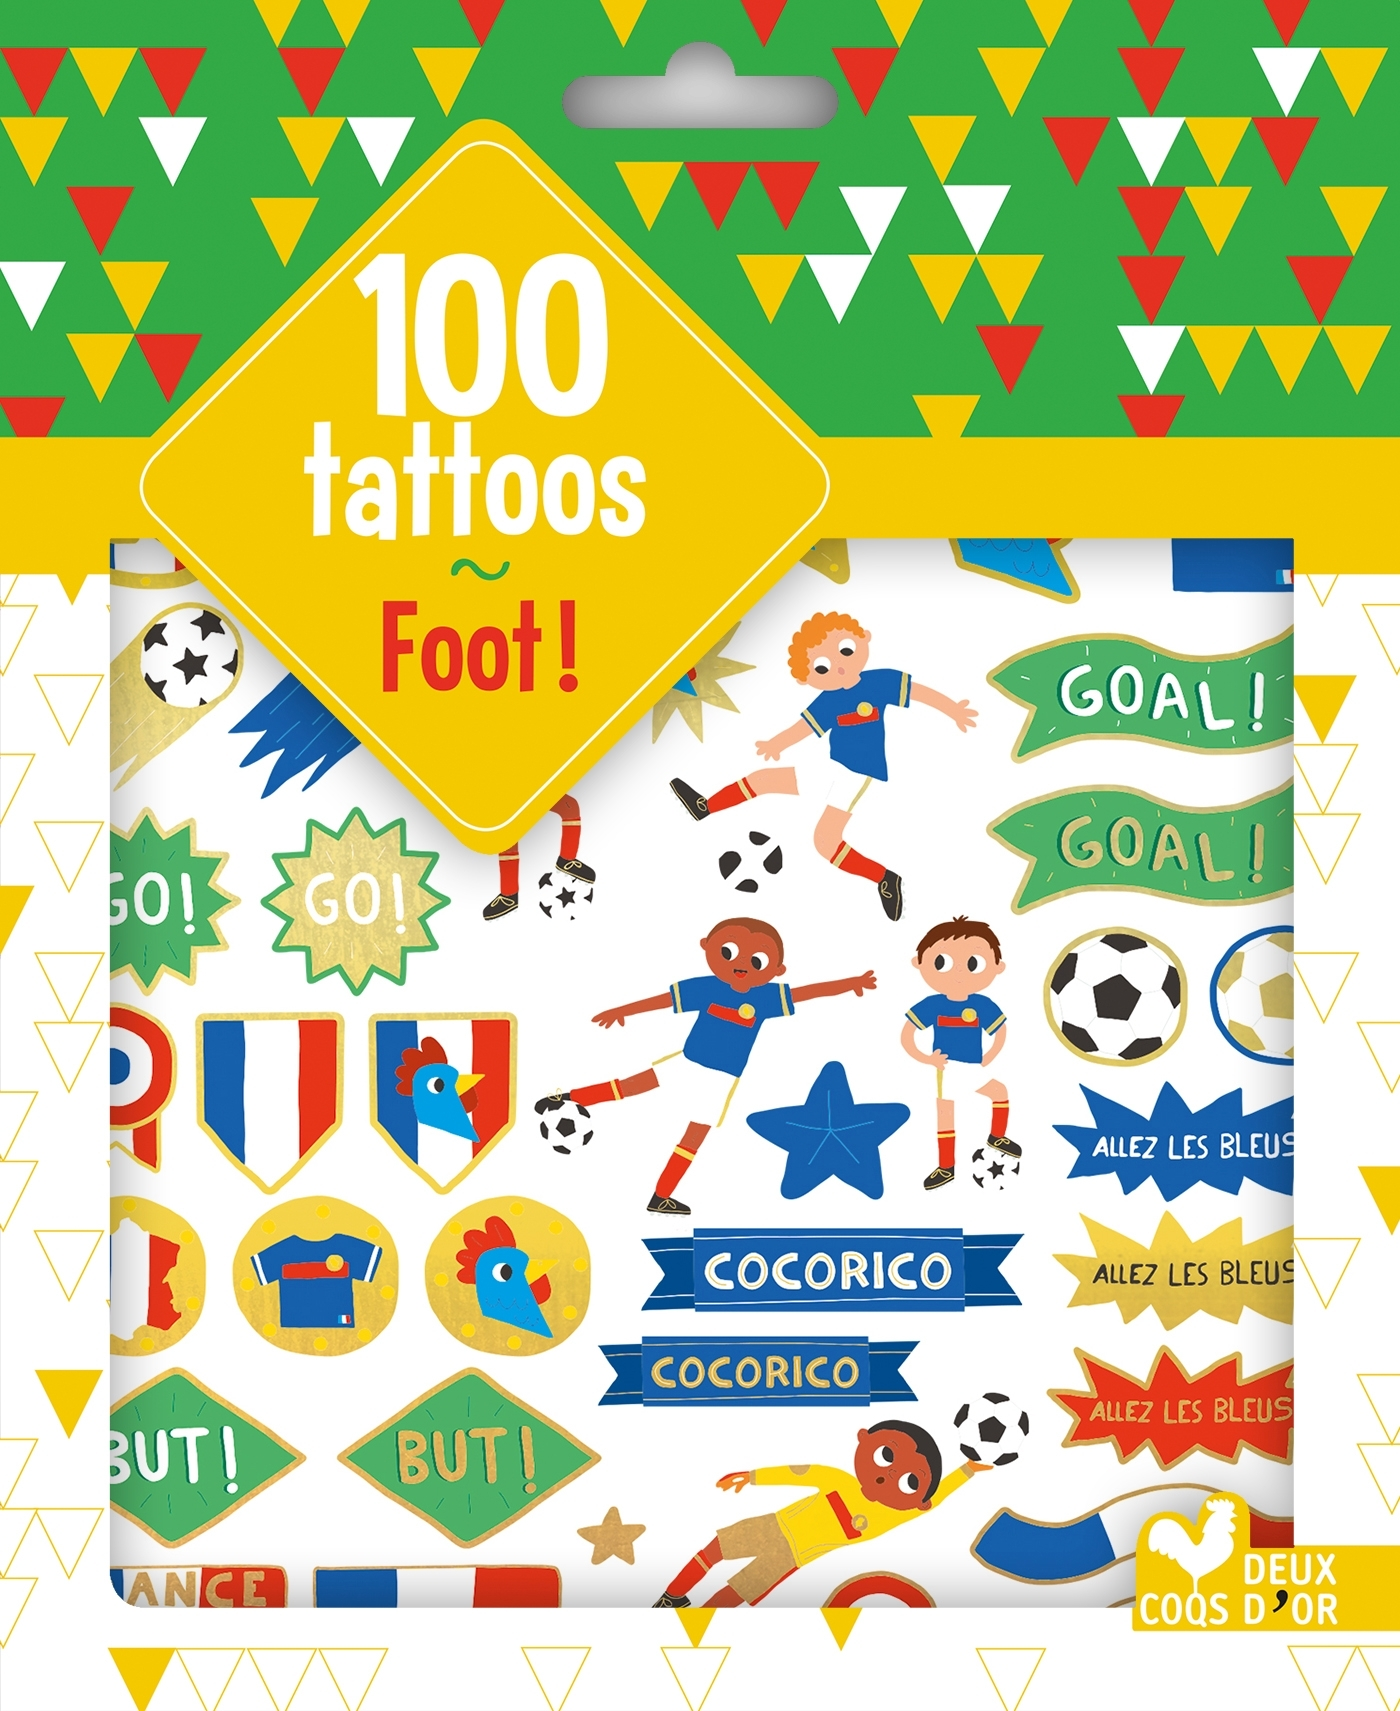 100 TATTOOS FOOT